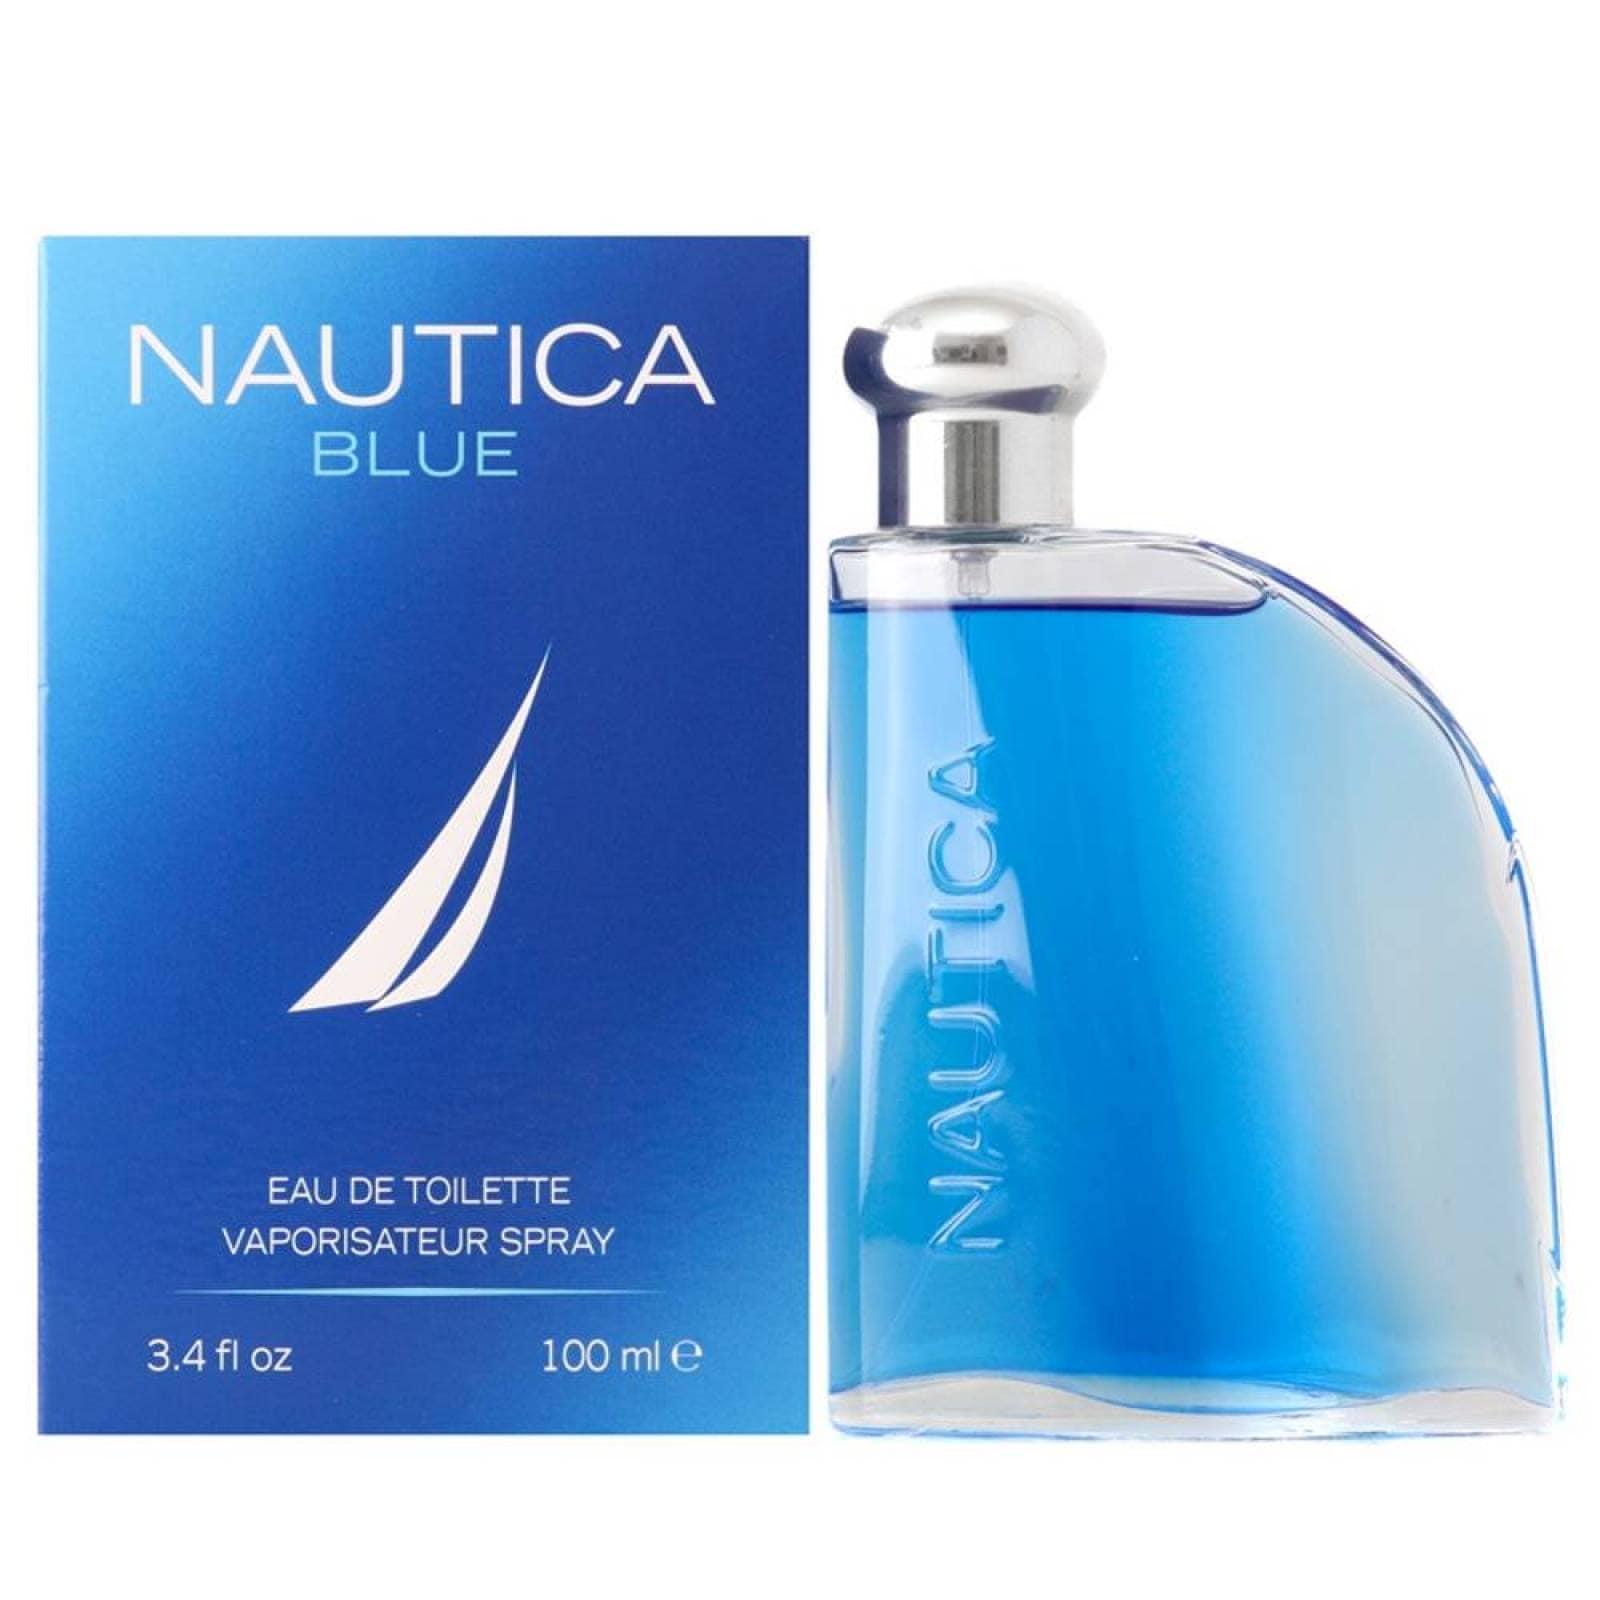 Nautica Blue de Nautica Eau de Toilette 100 ml Fragancia para Caballero